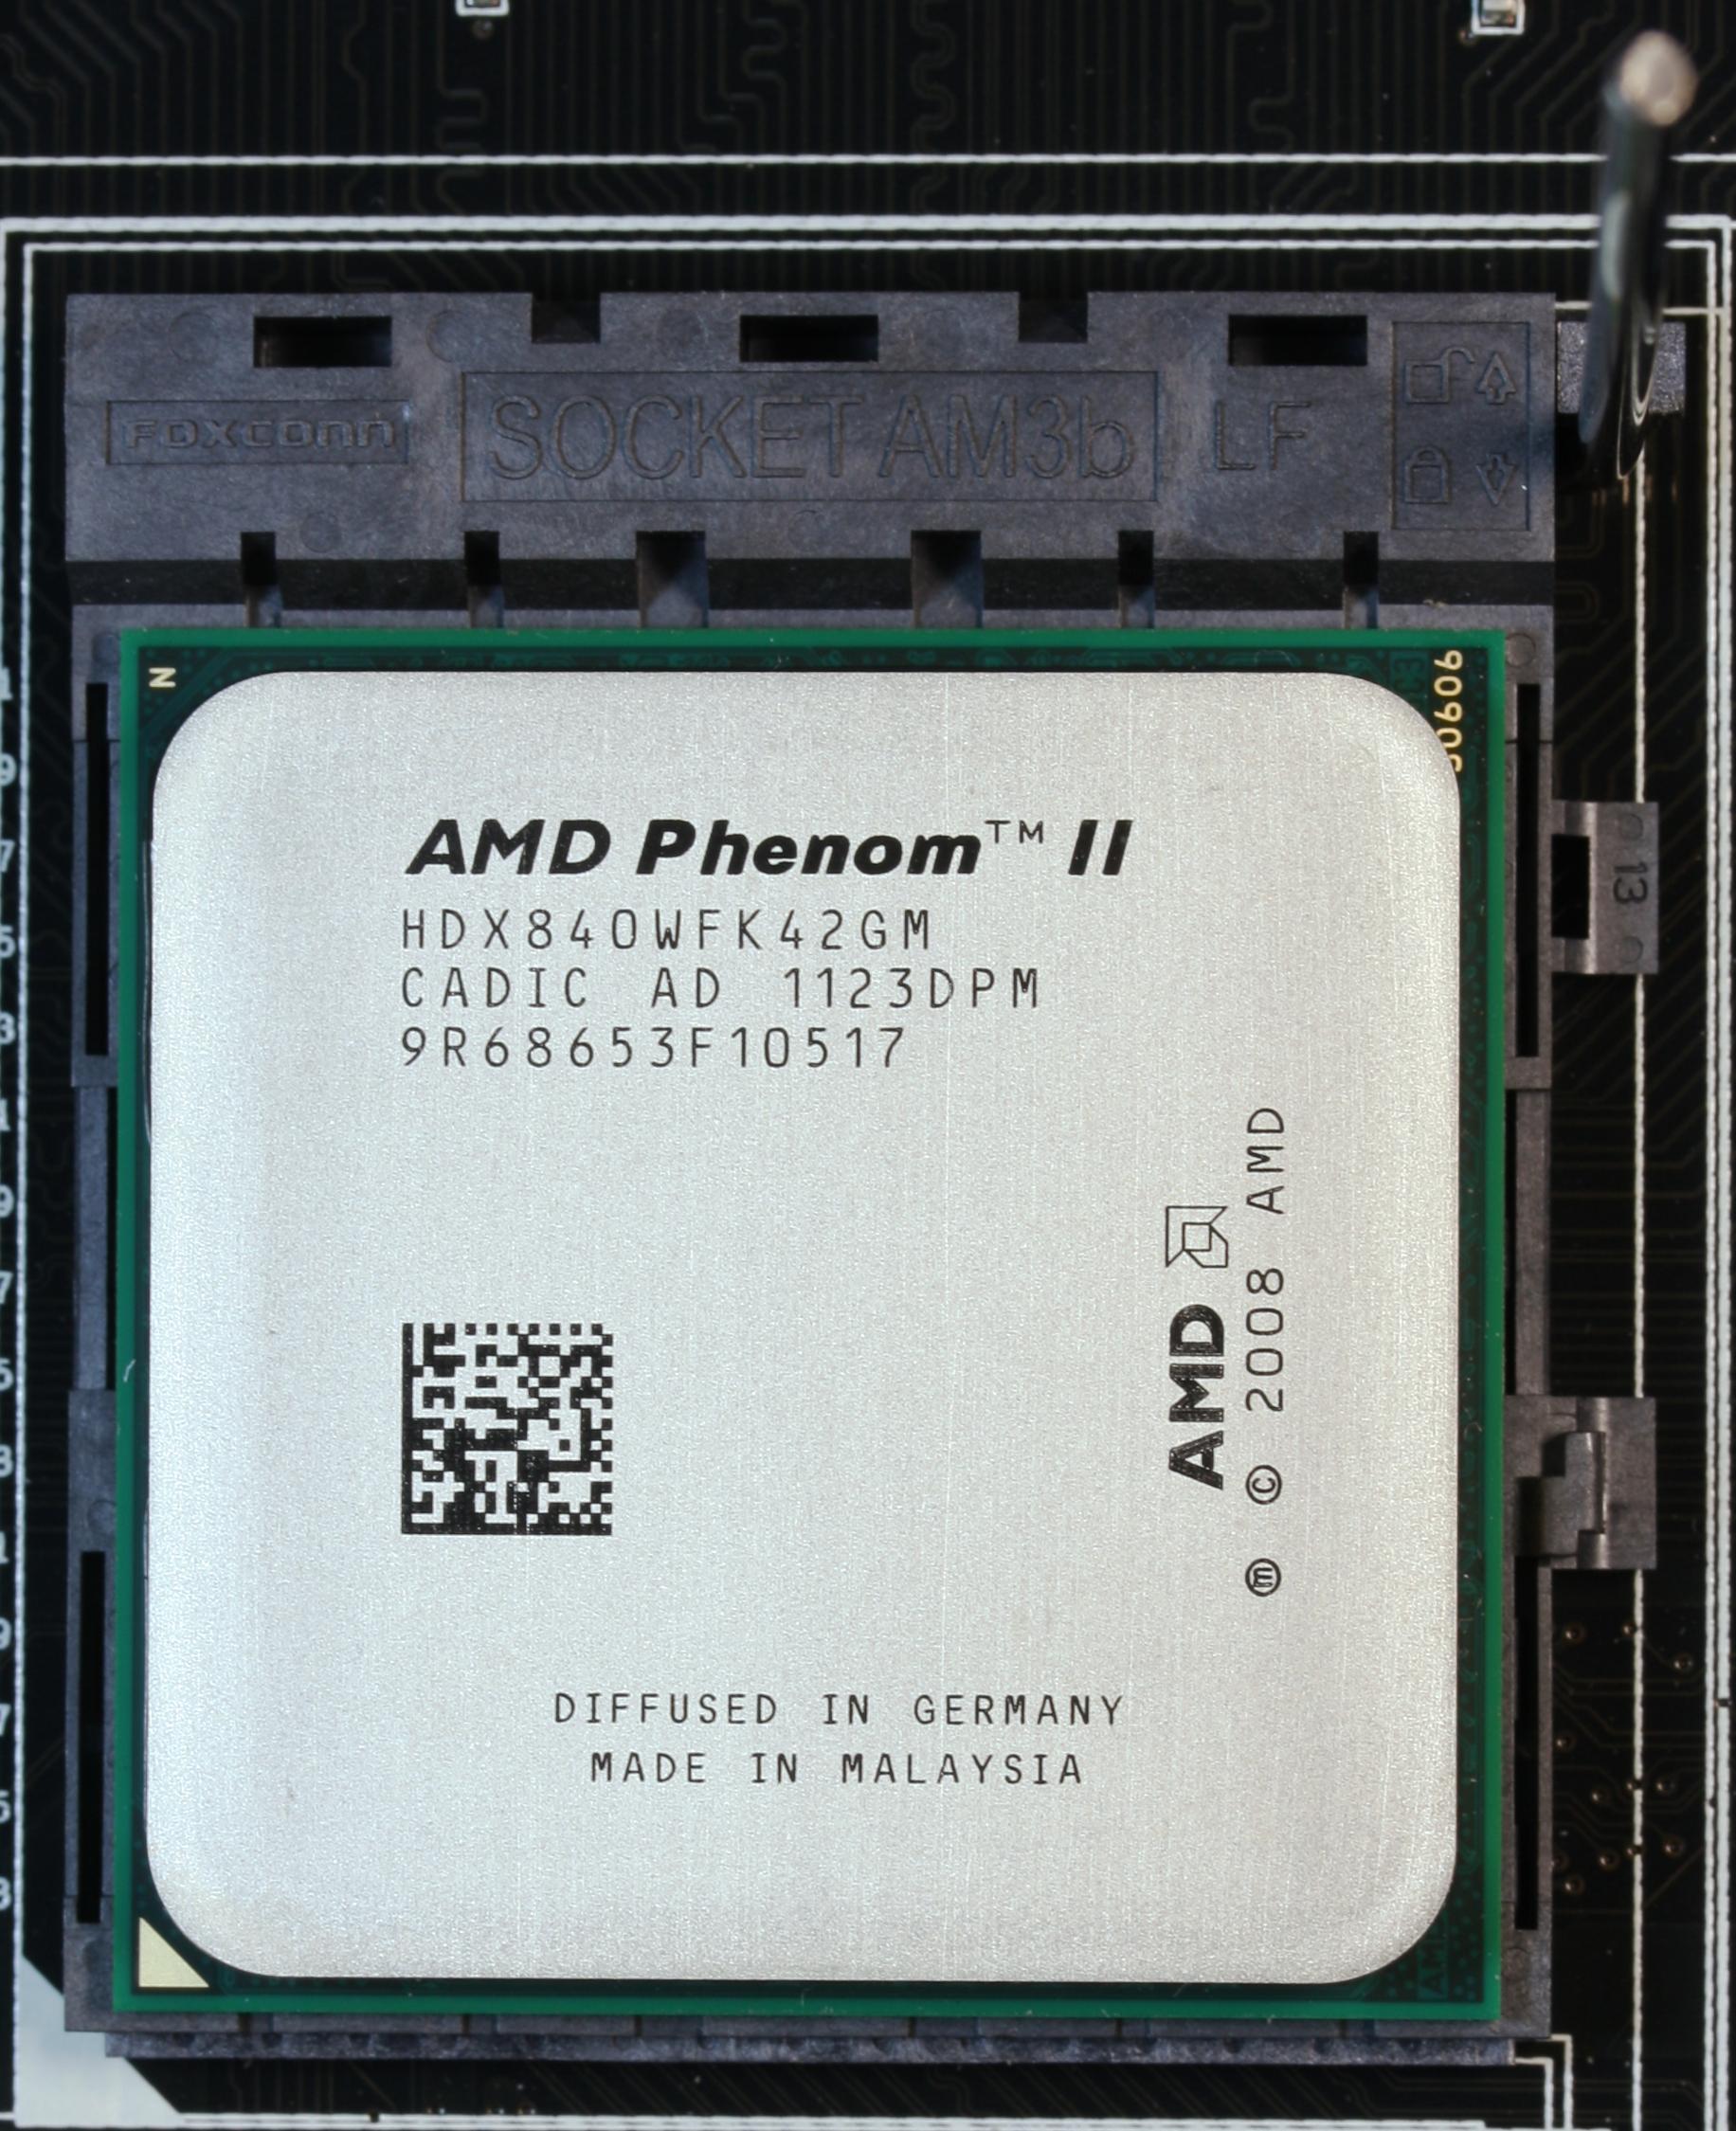 File Amd Am3 Cpu Socket Top Open With Amd Phenom Ii X4 840 Hdx840wfk42gm Cpu Pnr 0378 Jpg Wikimedia Commons